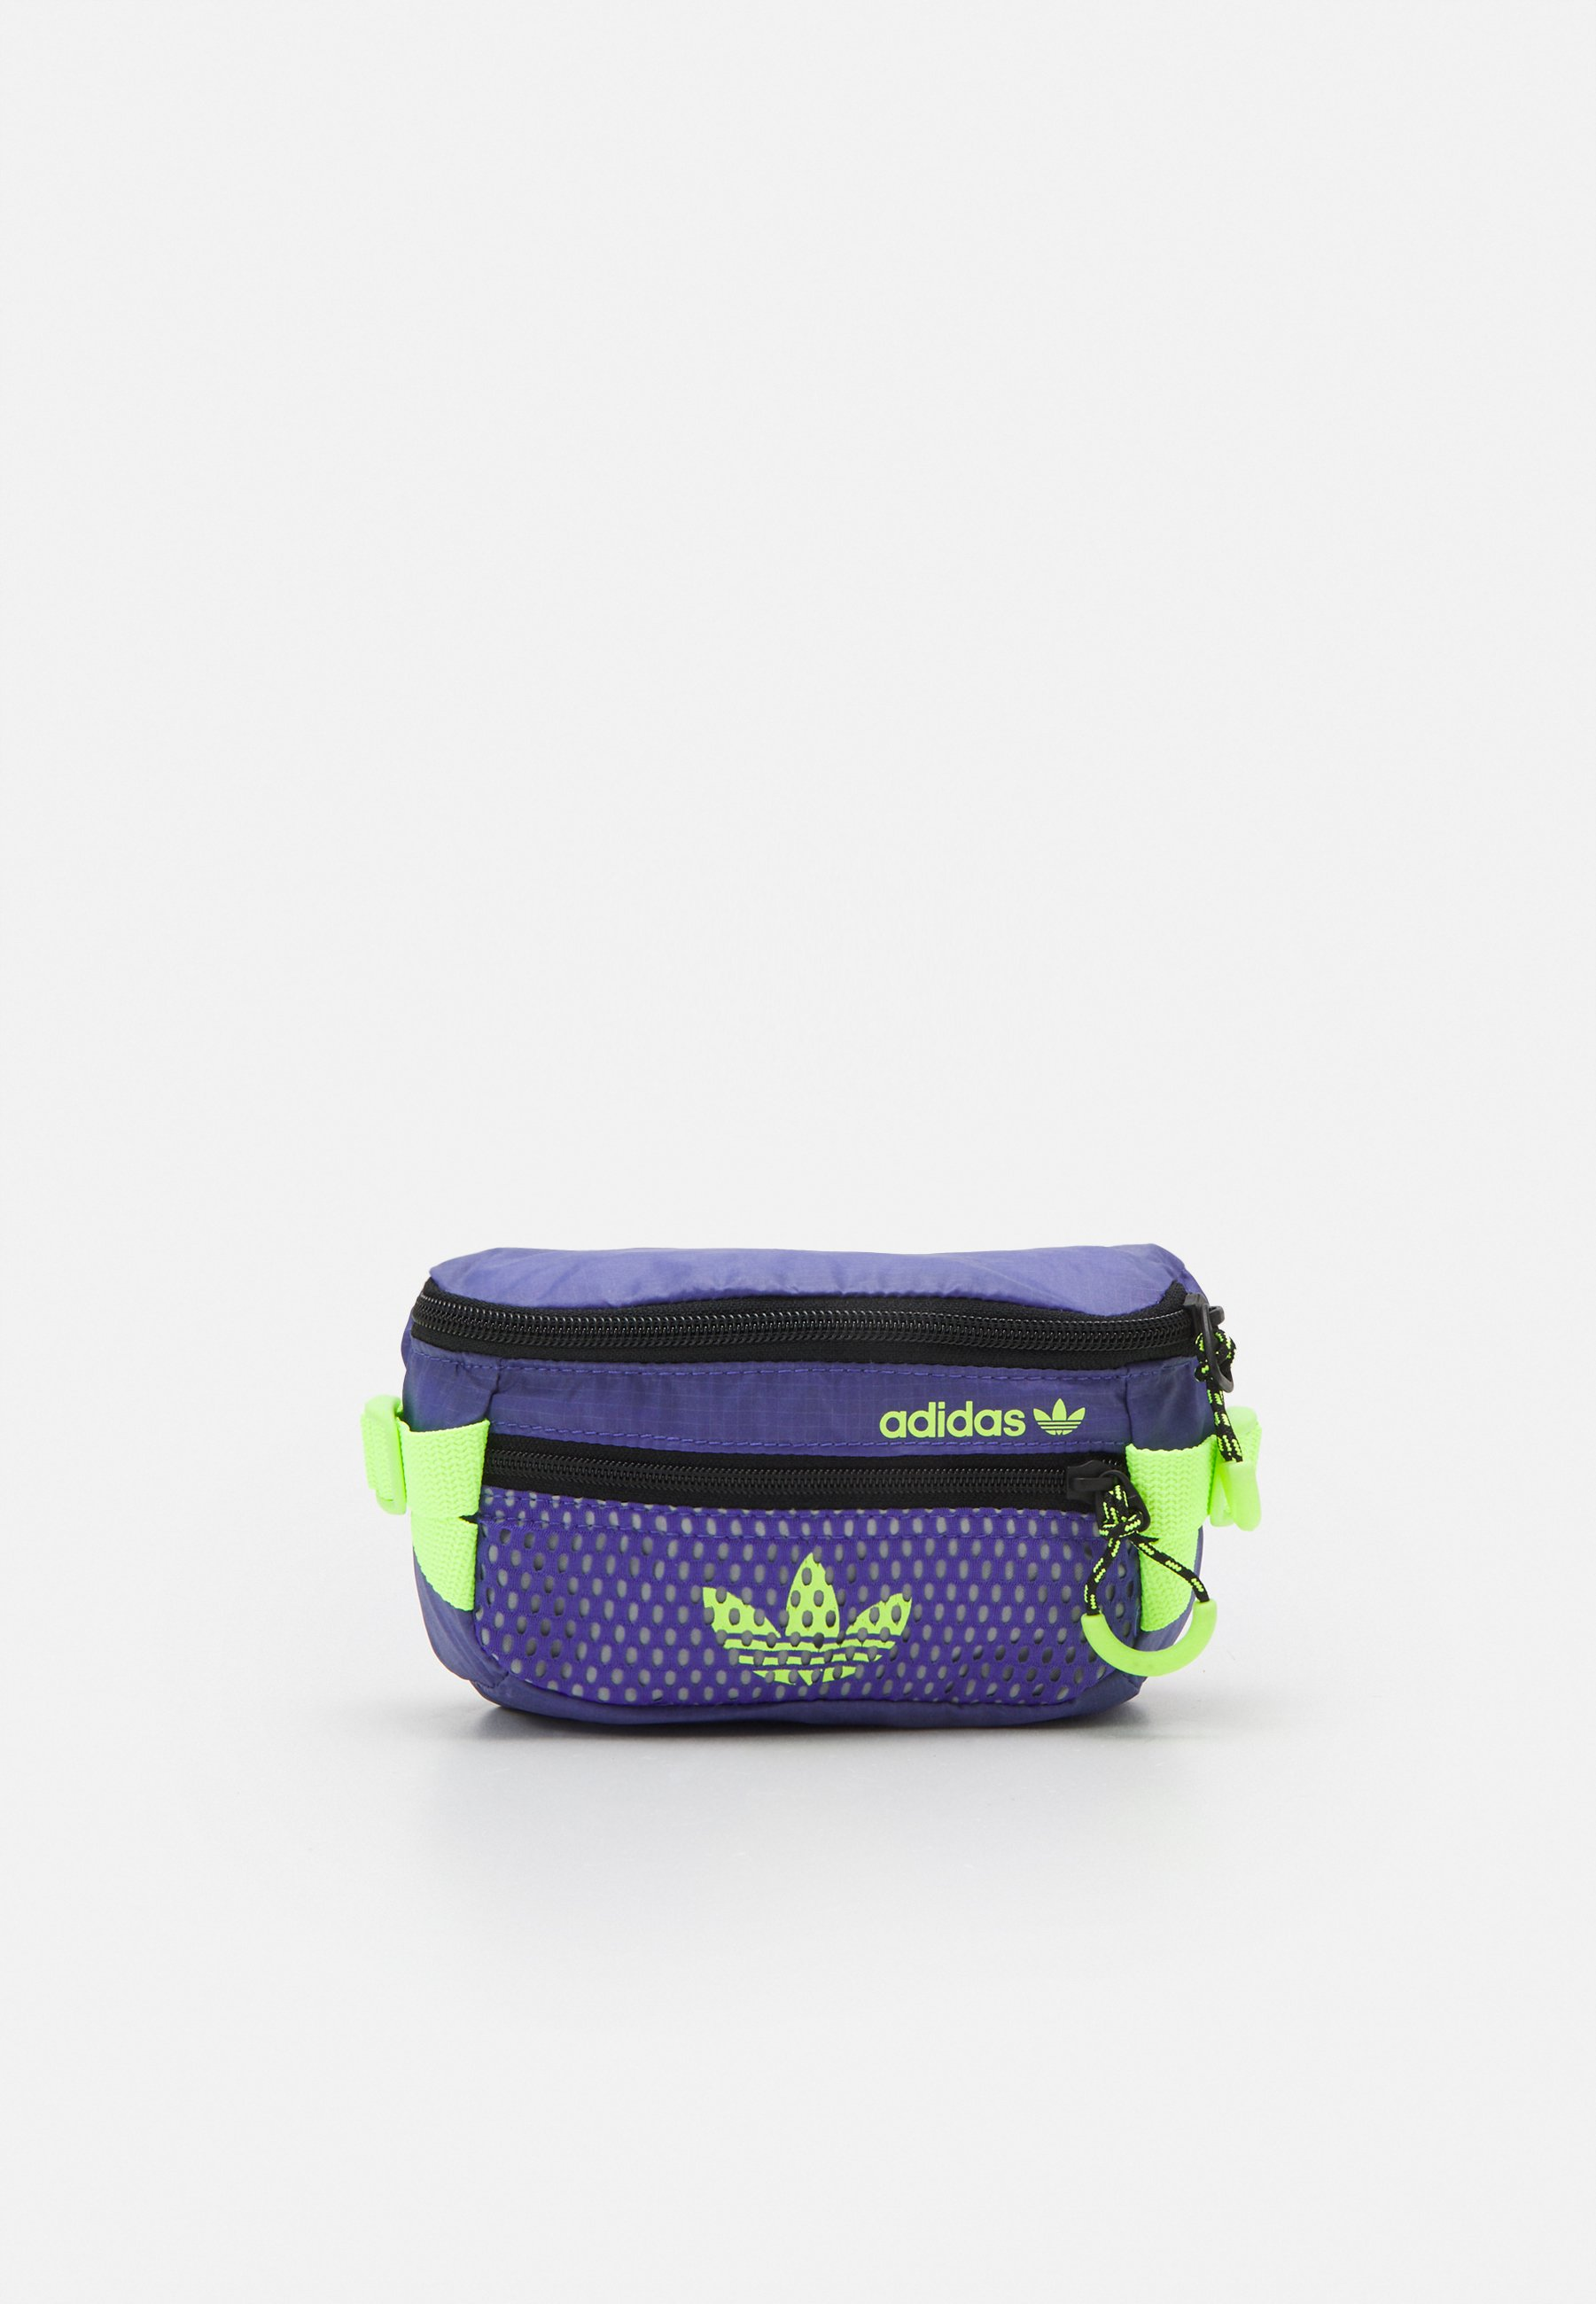 WAISTBAG UNISEX - Sac banane - purple/black/signal green